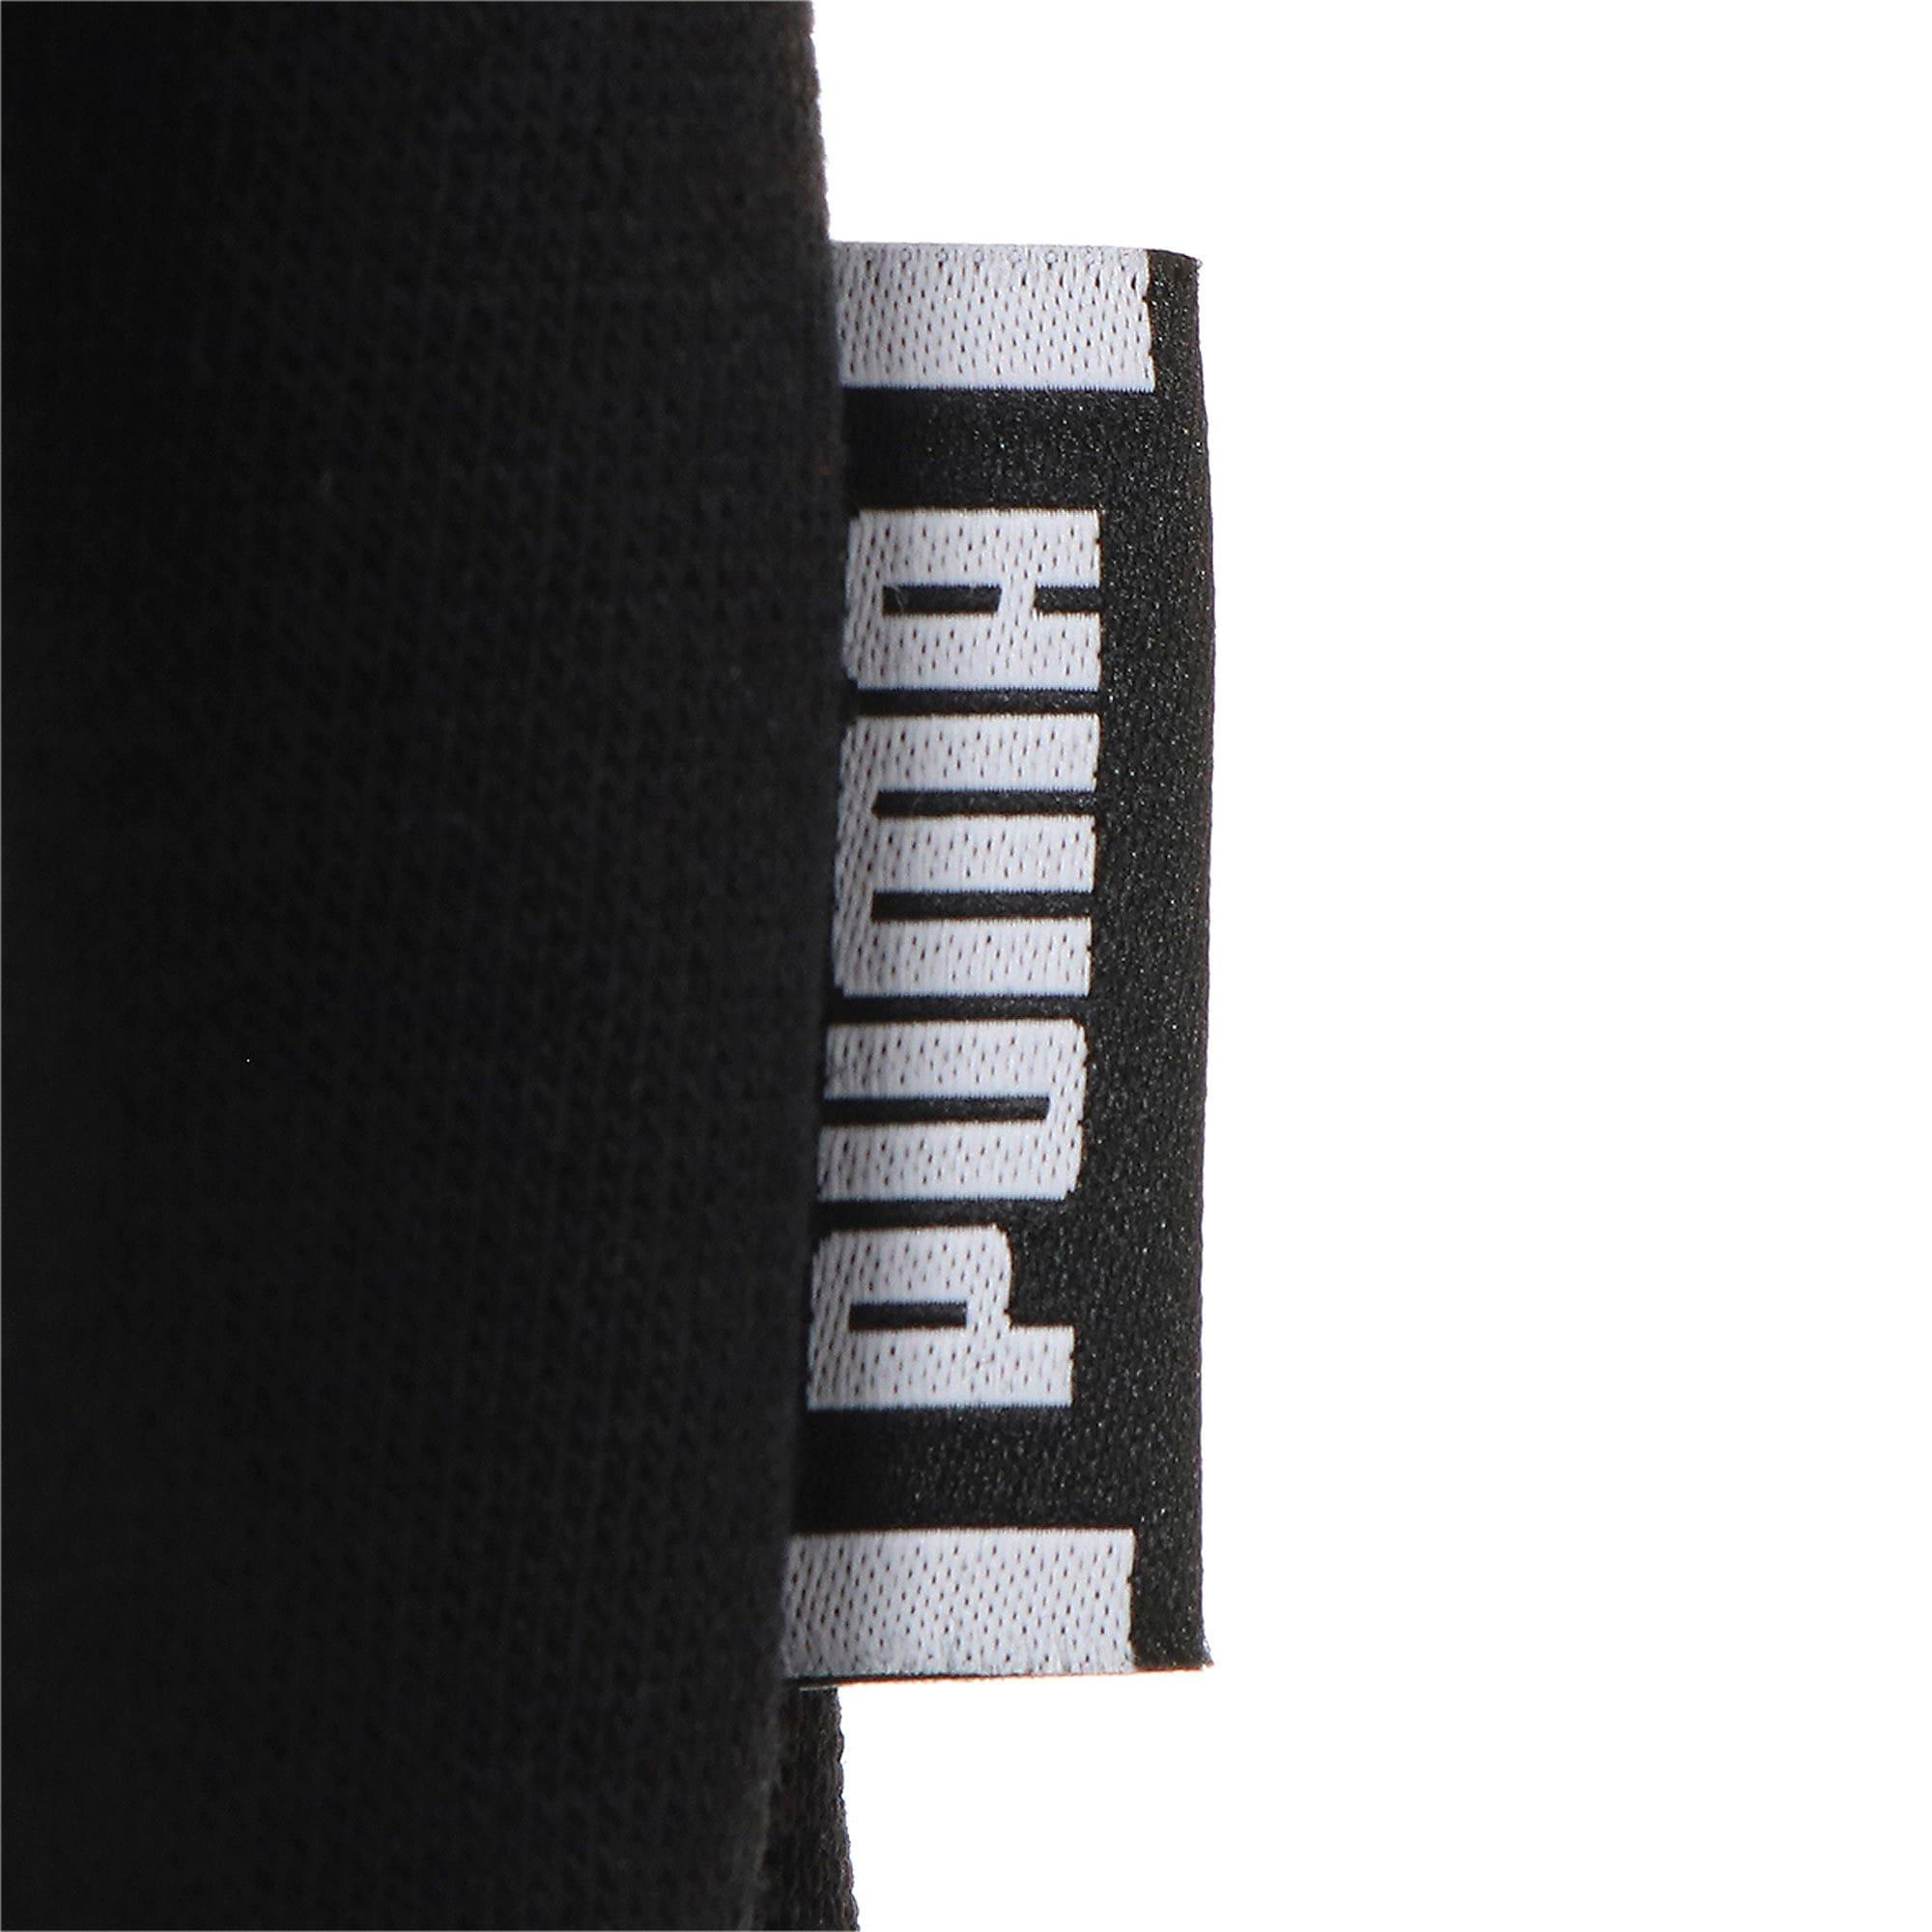 Thumbnail 10 of ダウンタウン ウィメンズ スウェットパンツ, Puma Black, medium-JPN